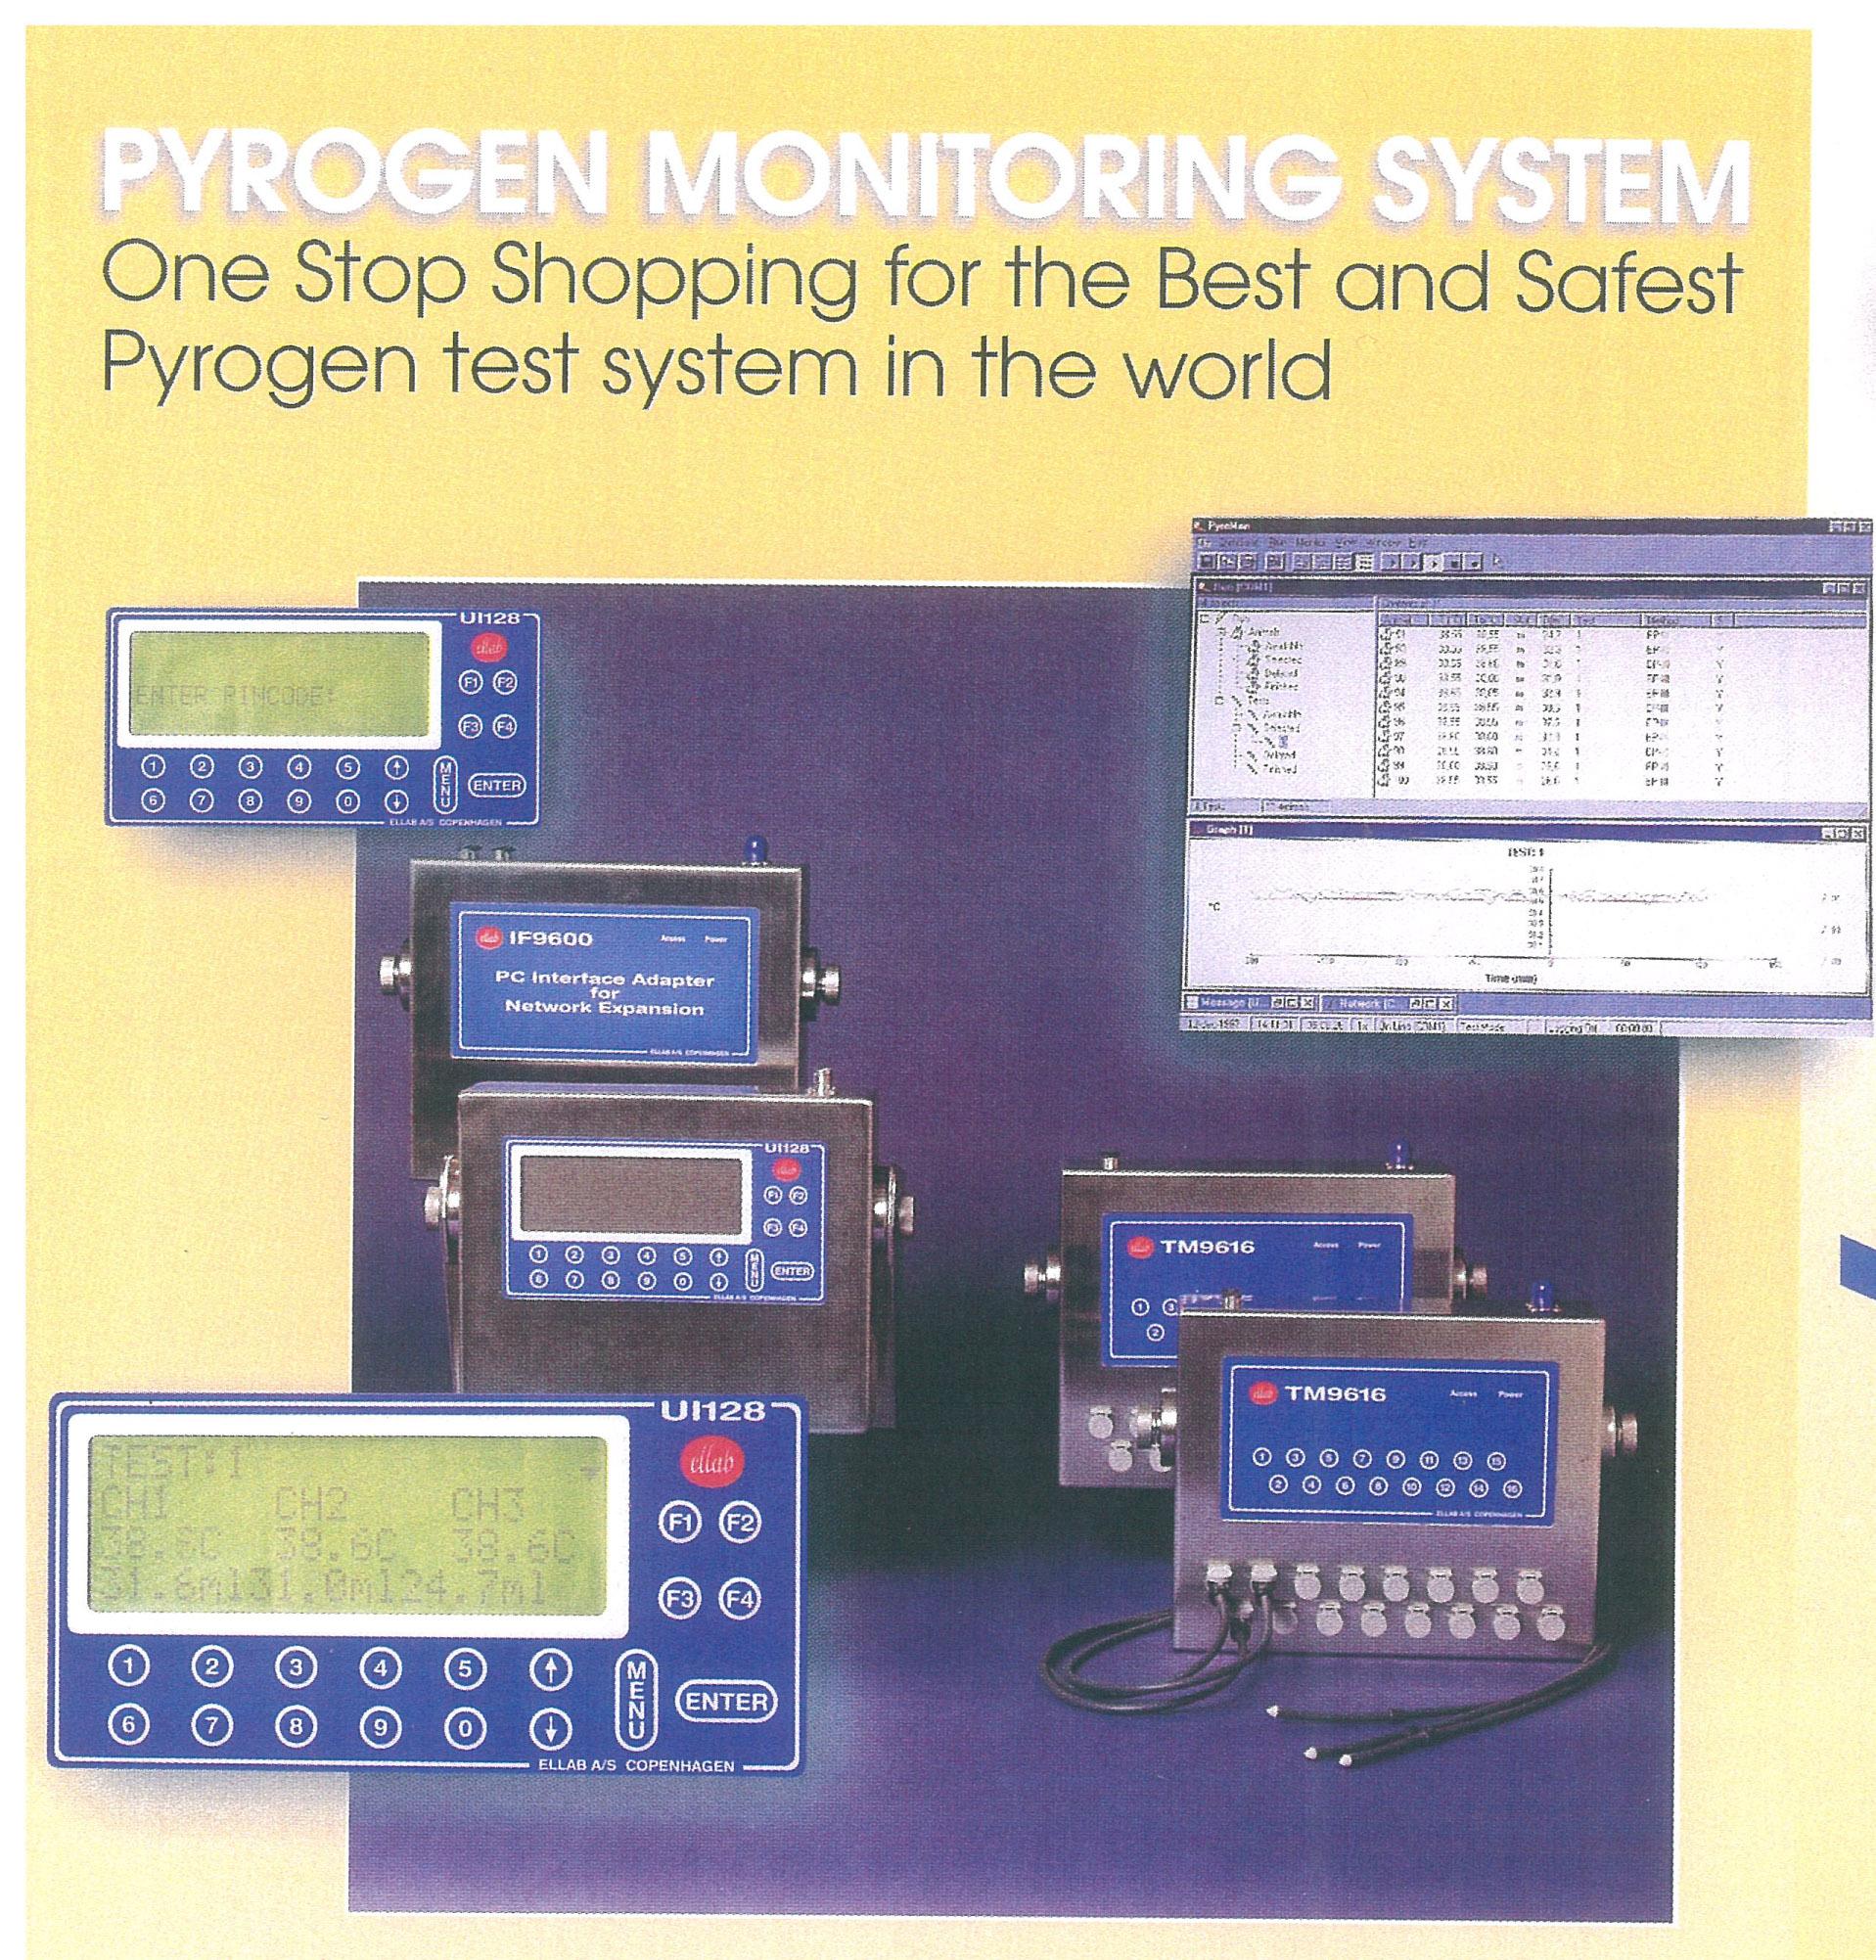 PyroMonsystem